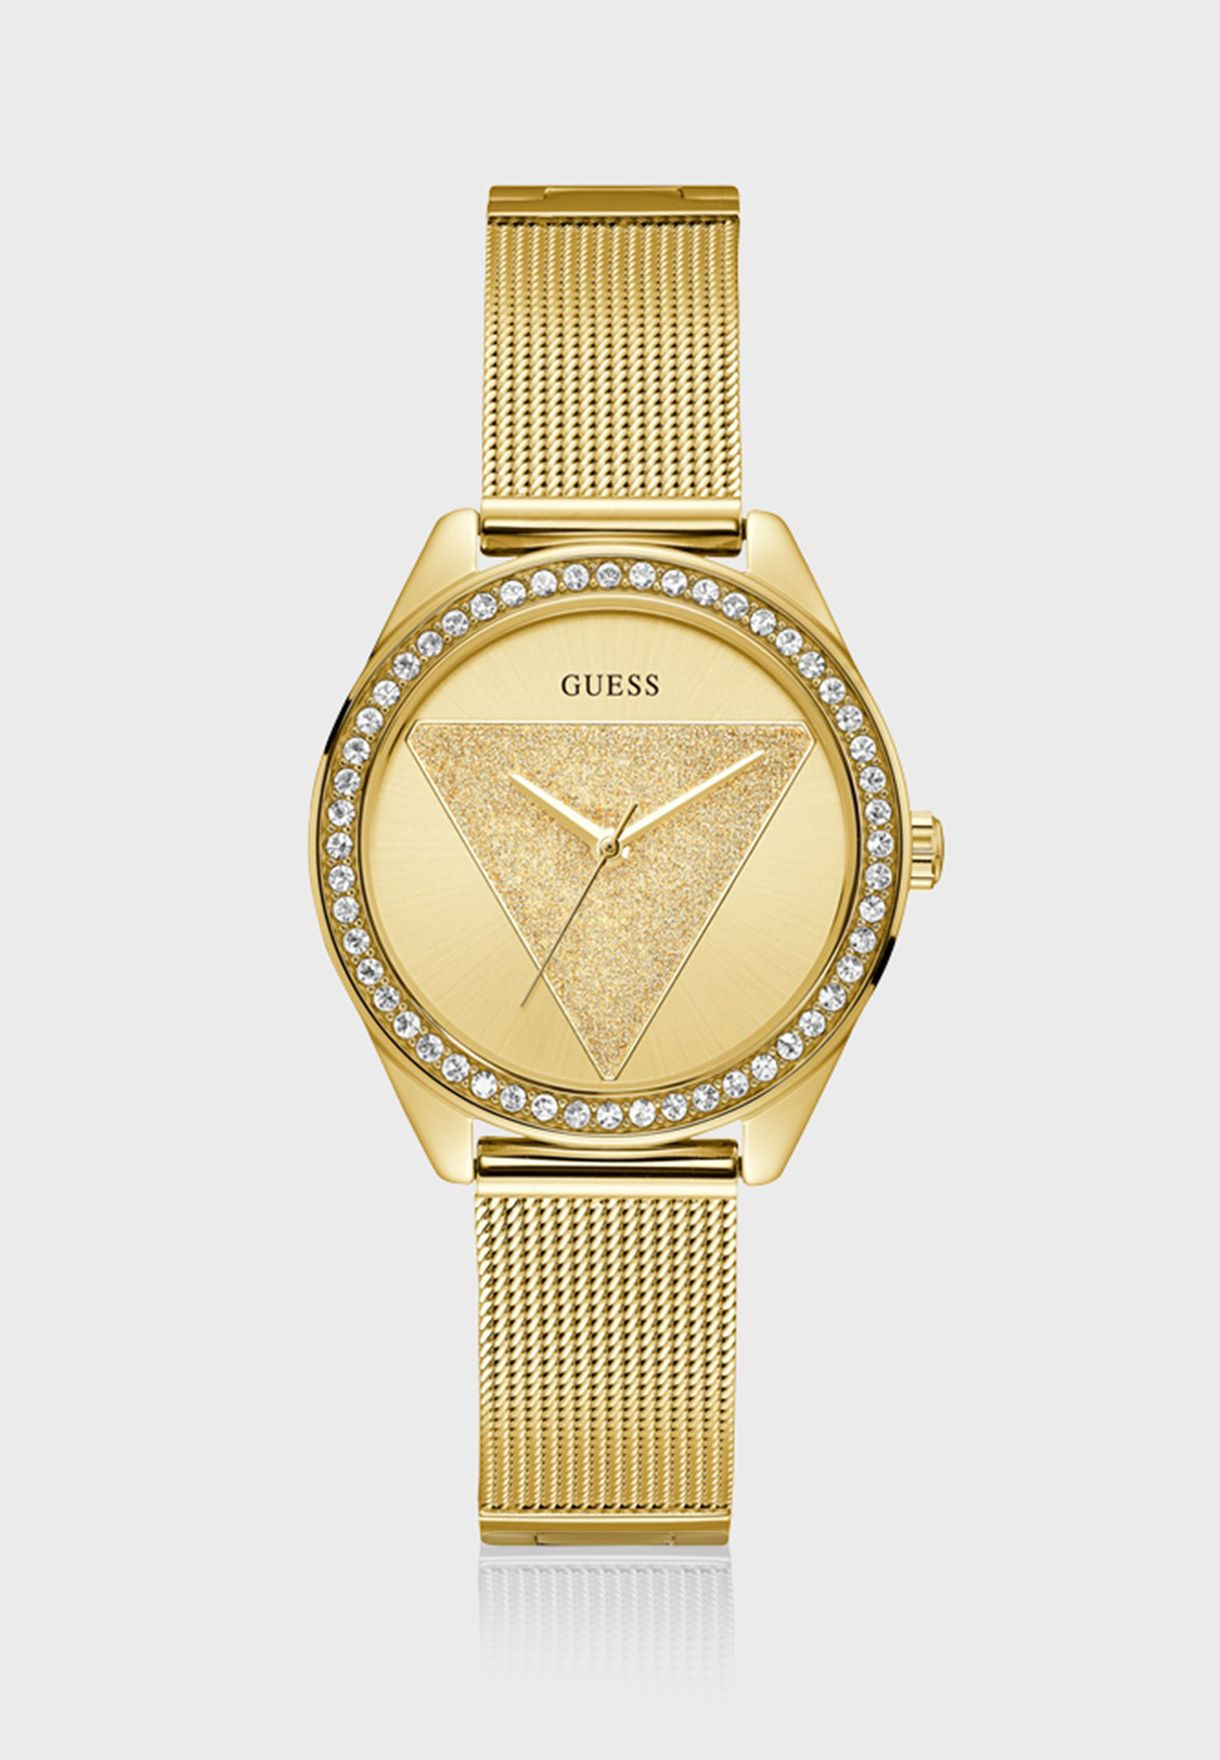 527beb8221e39 تسوق ساعة تري جليتز انالوج ماركة جيس لون ذهبي W1142L2 في قطر ...